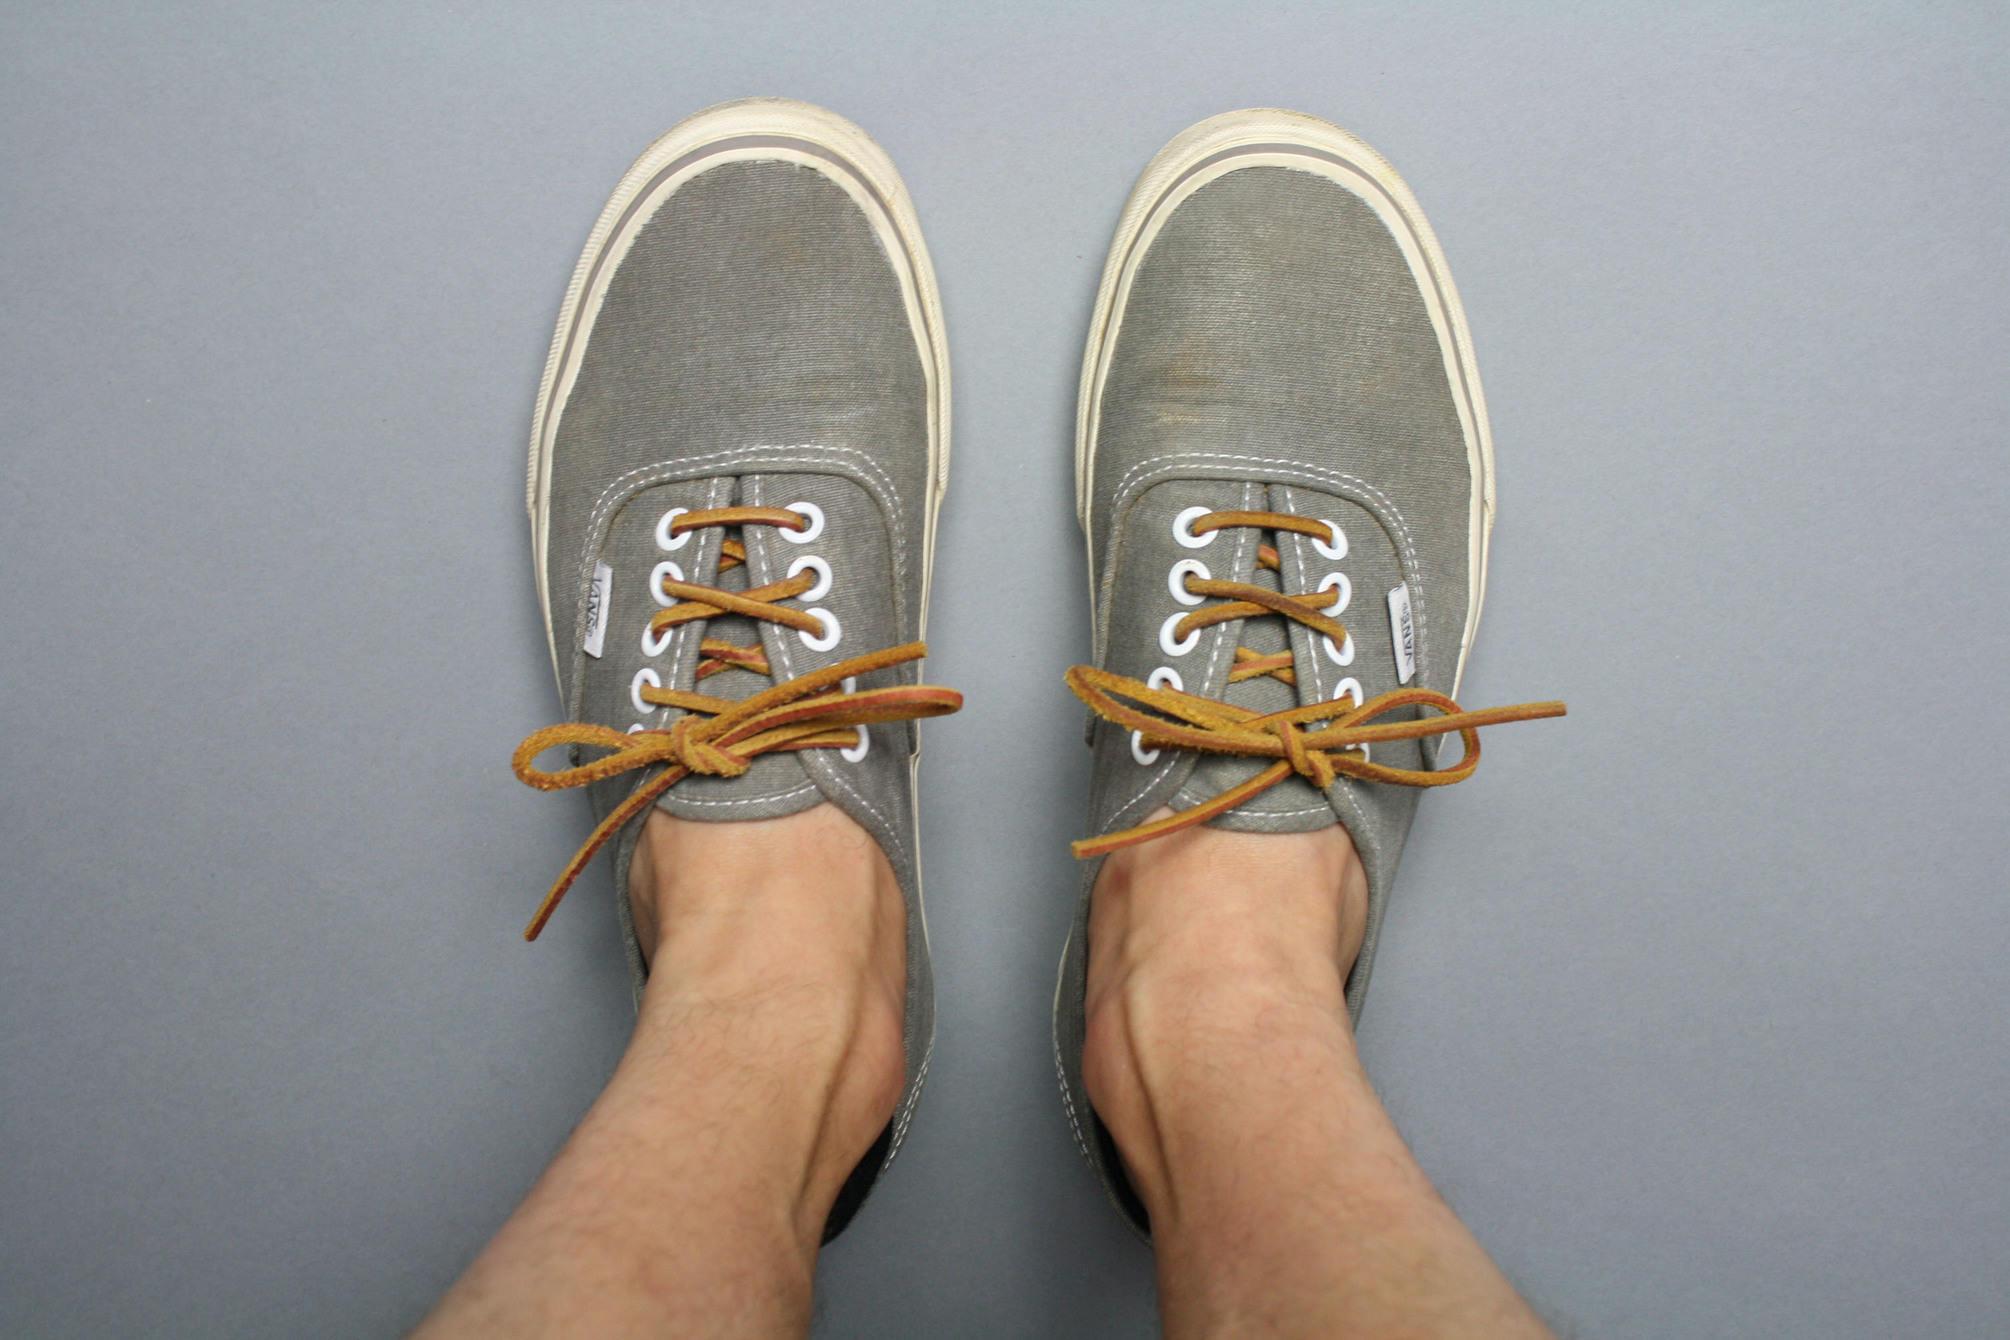 Stomper Joe no show socks with shoes